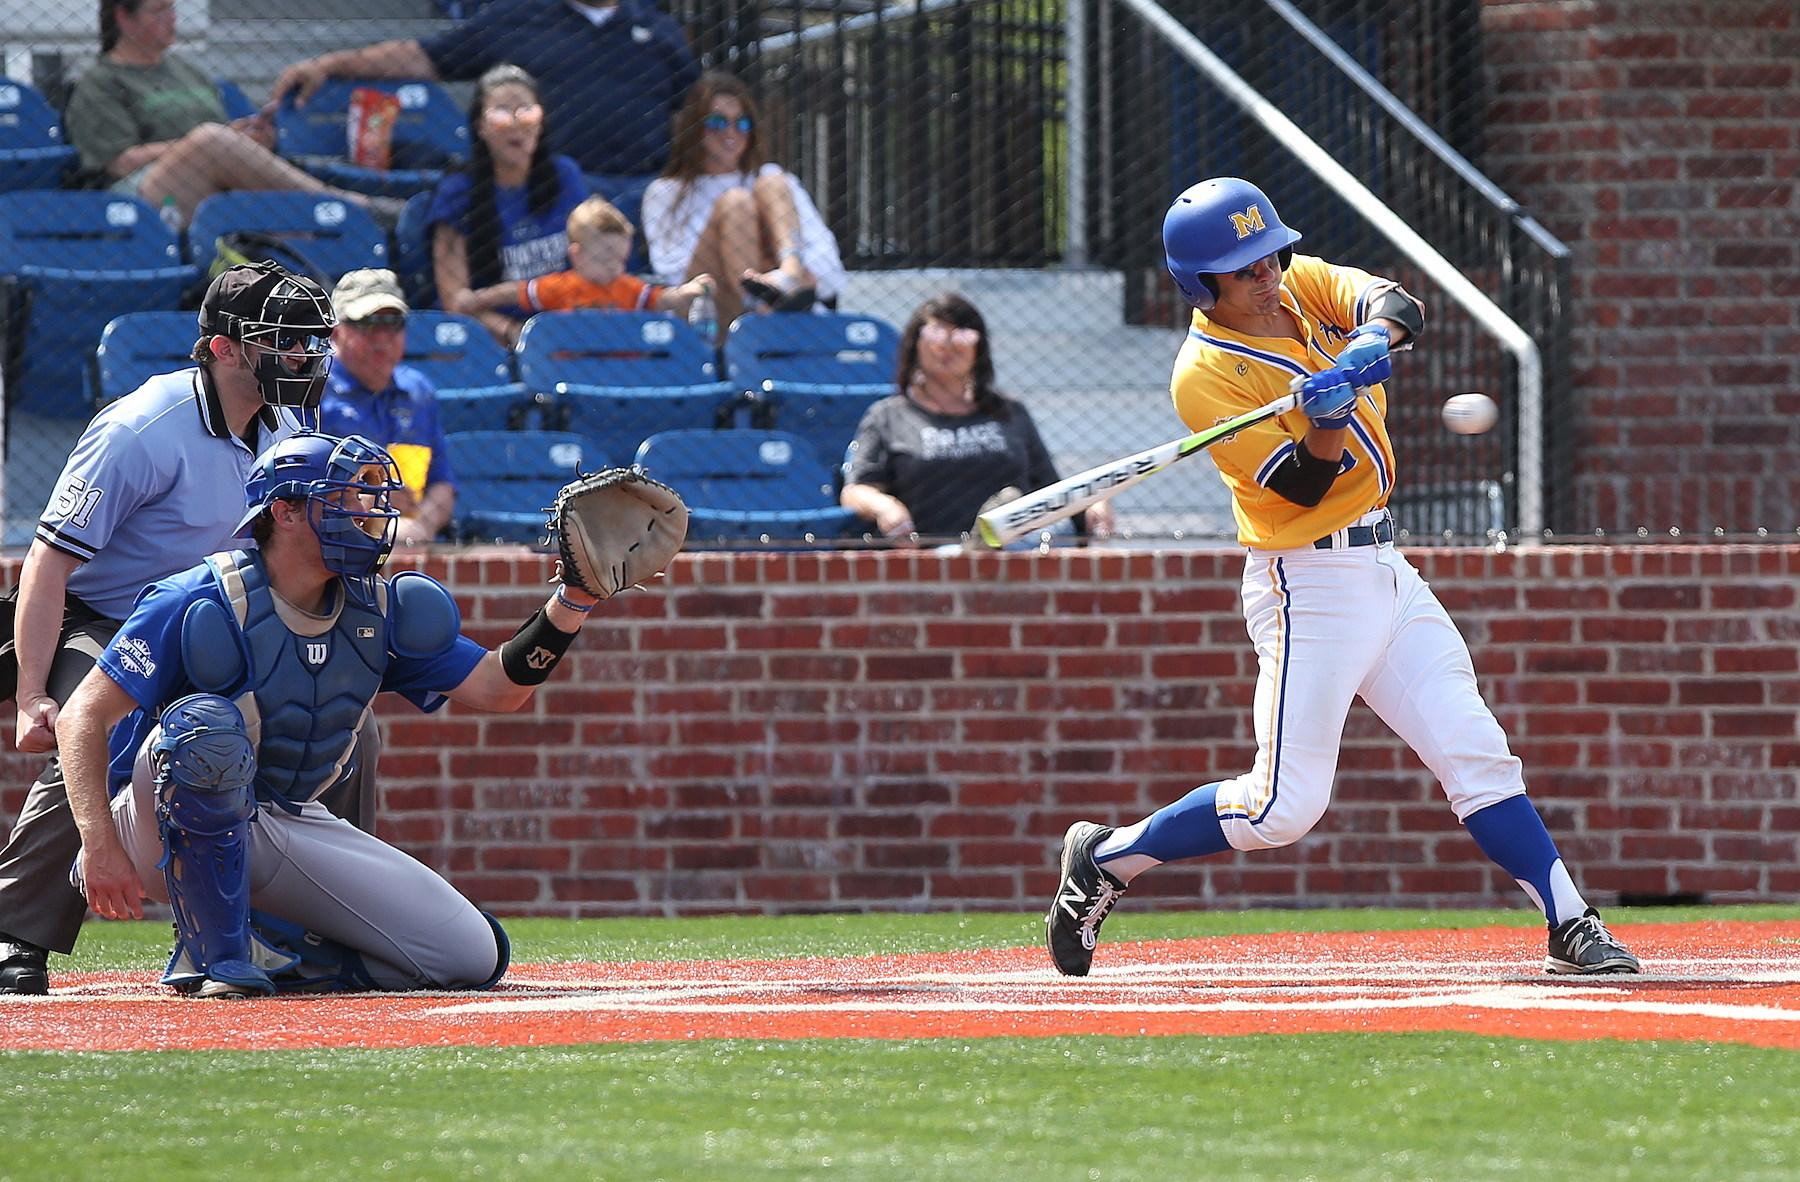 McNeese Baseball (Photo provided by Matt Bonnette SID MSU)